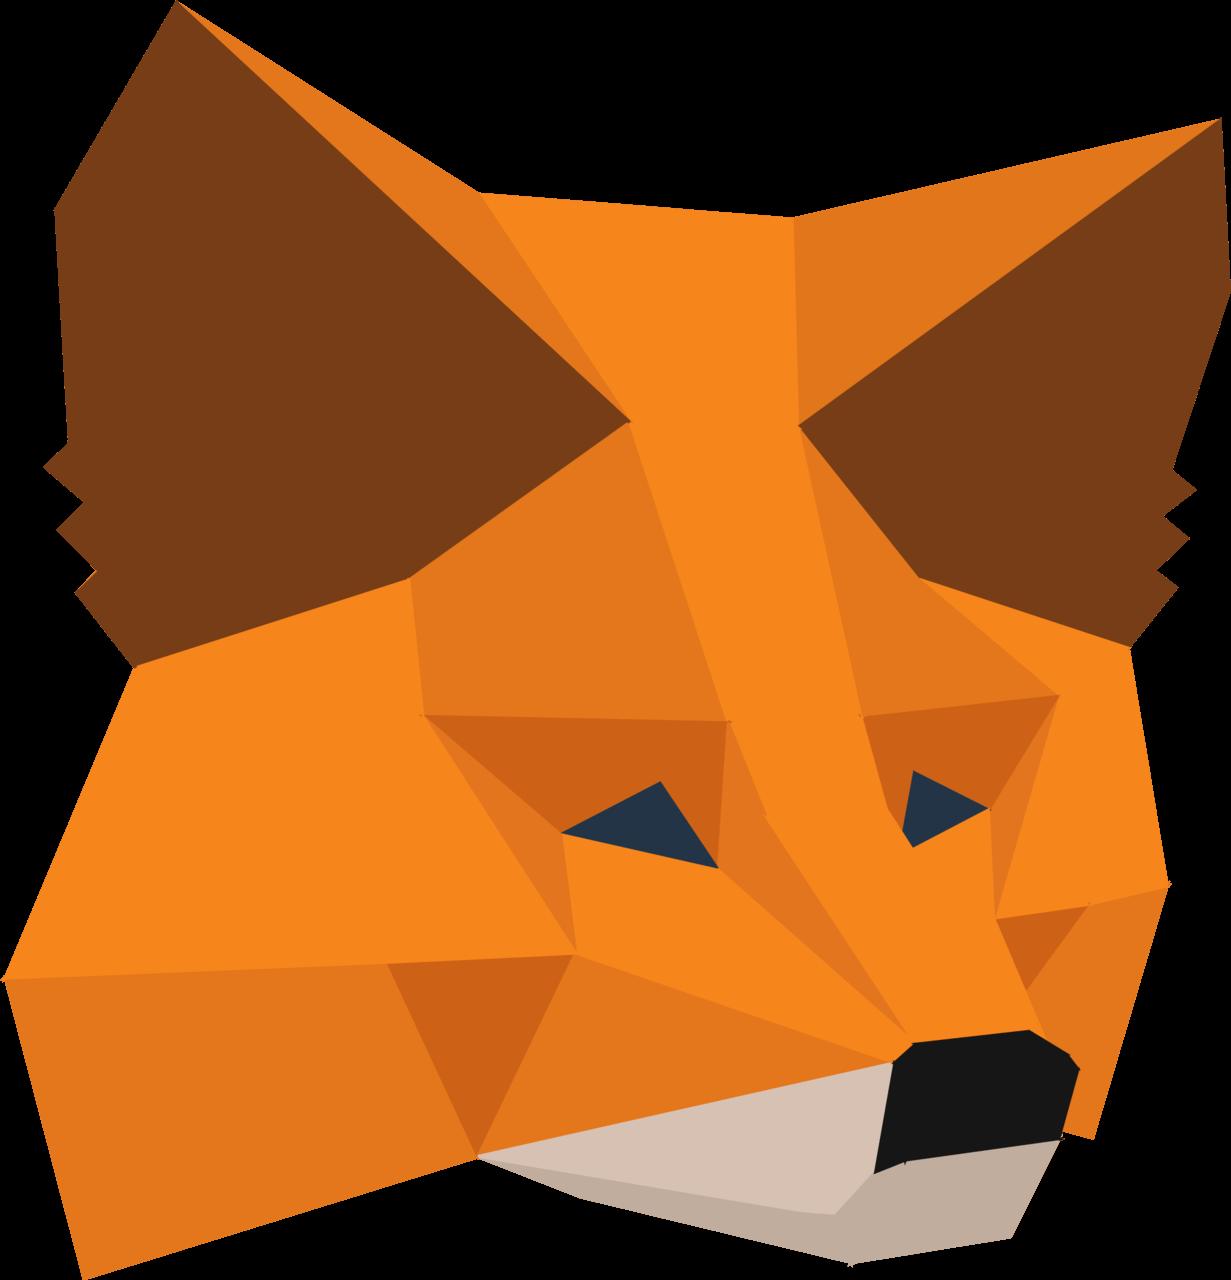 metamask review logo